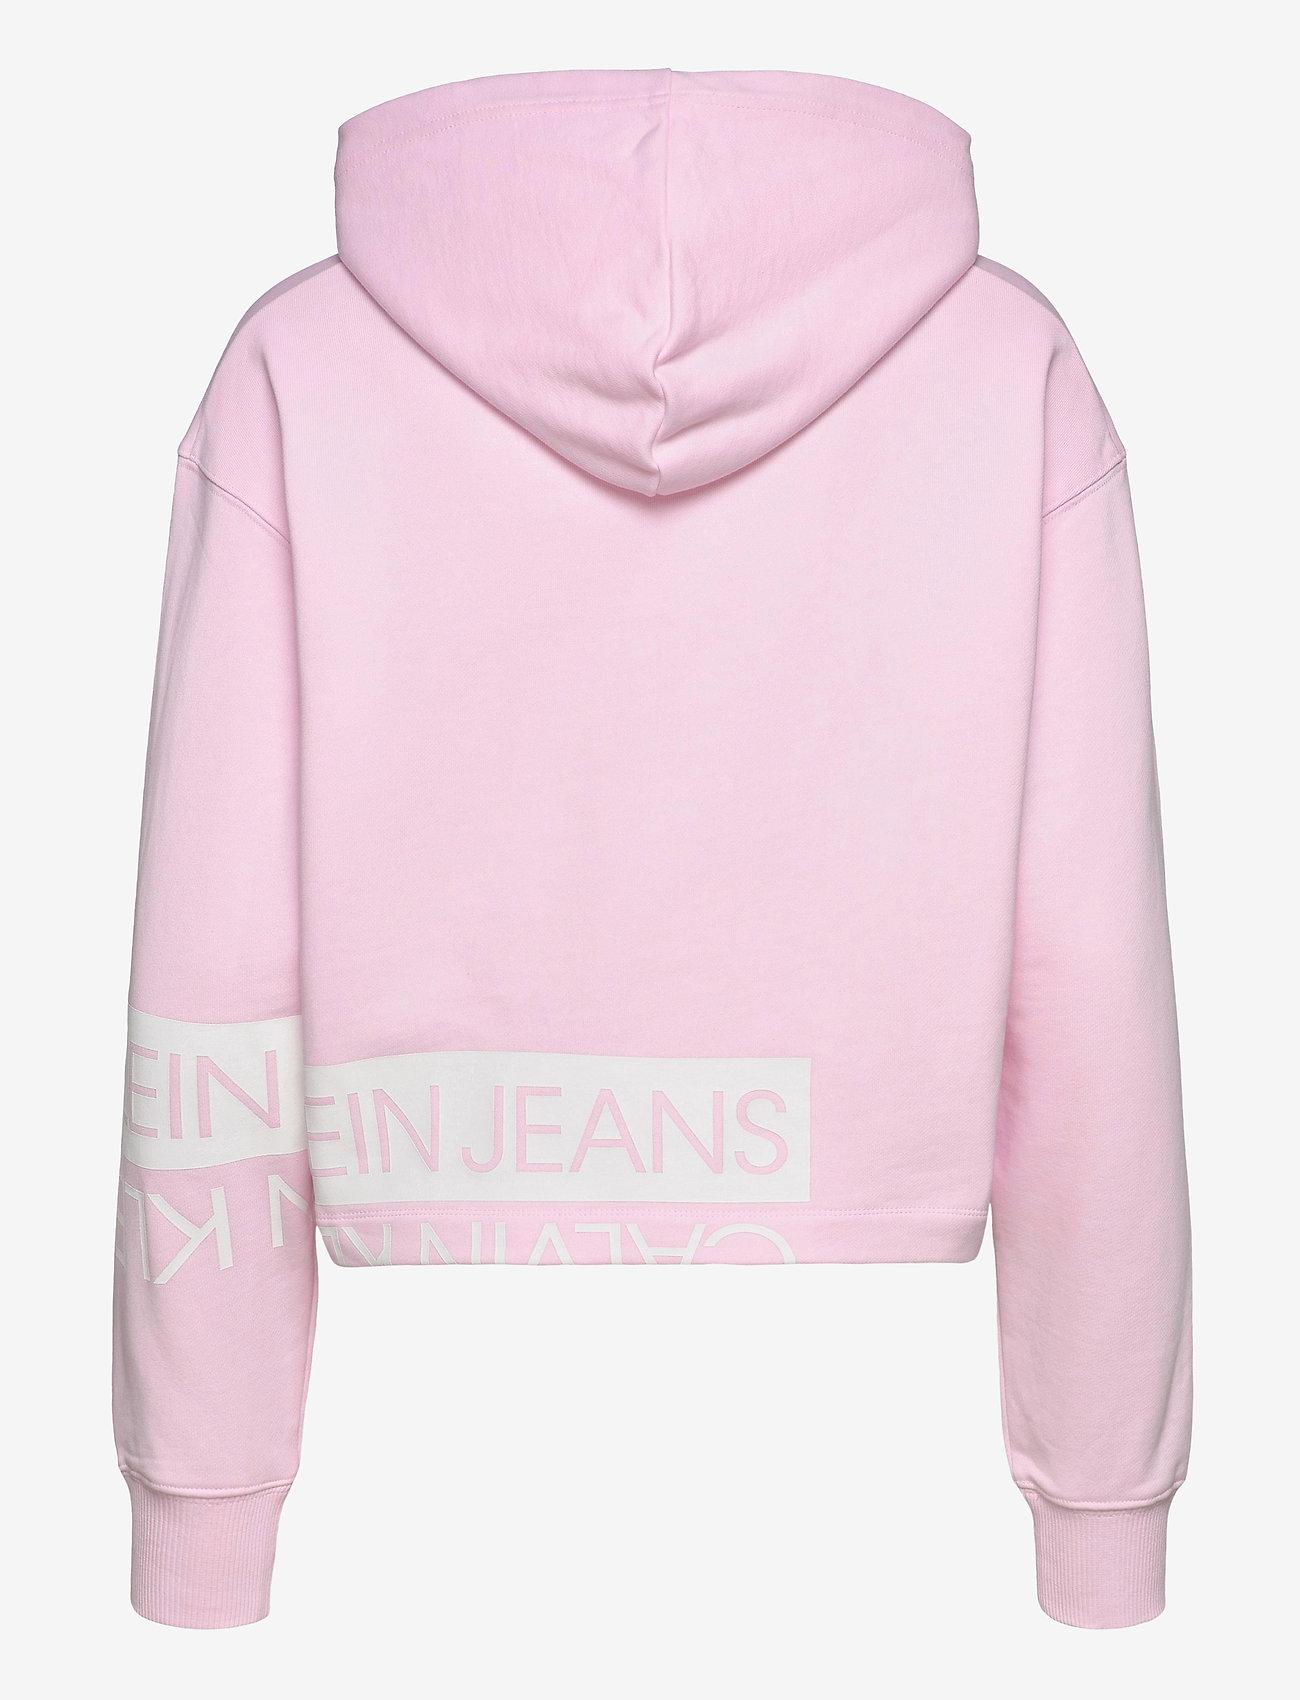 Calvin Klein Jeans - MIRRORED LOGO HOODIE - gensere og hettegensere - pearly pink / bright white - 1